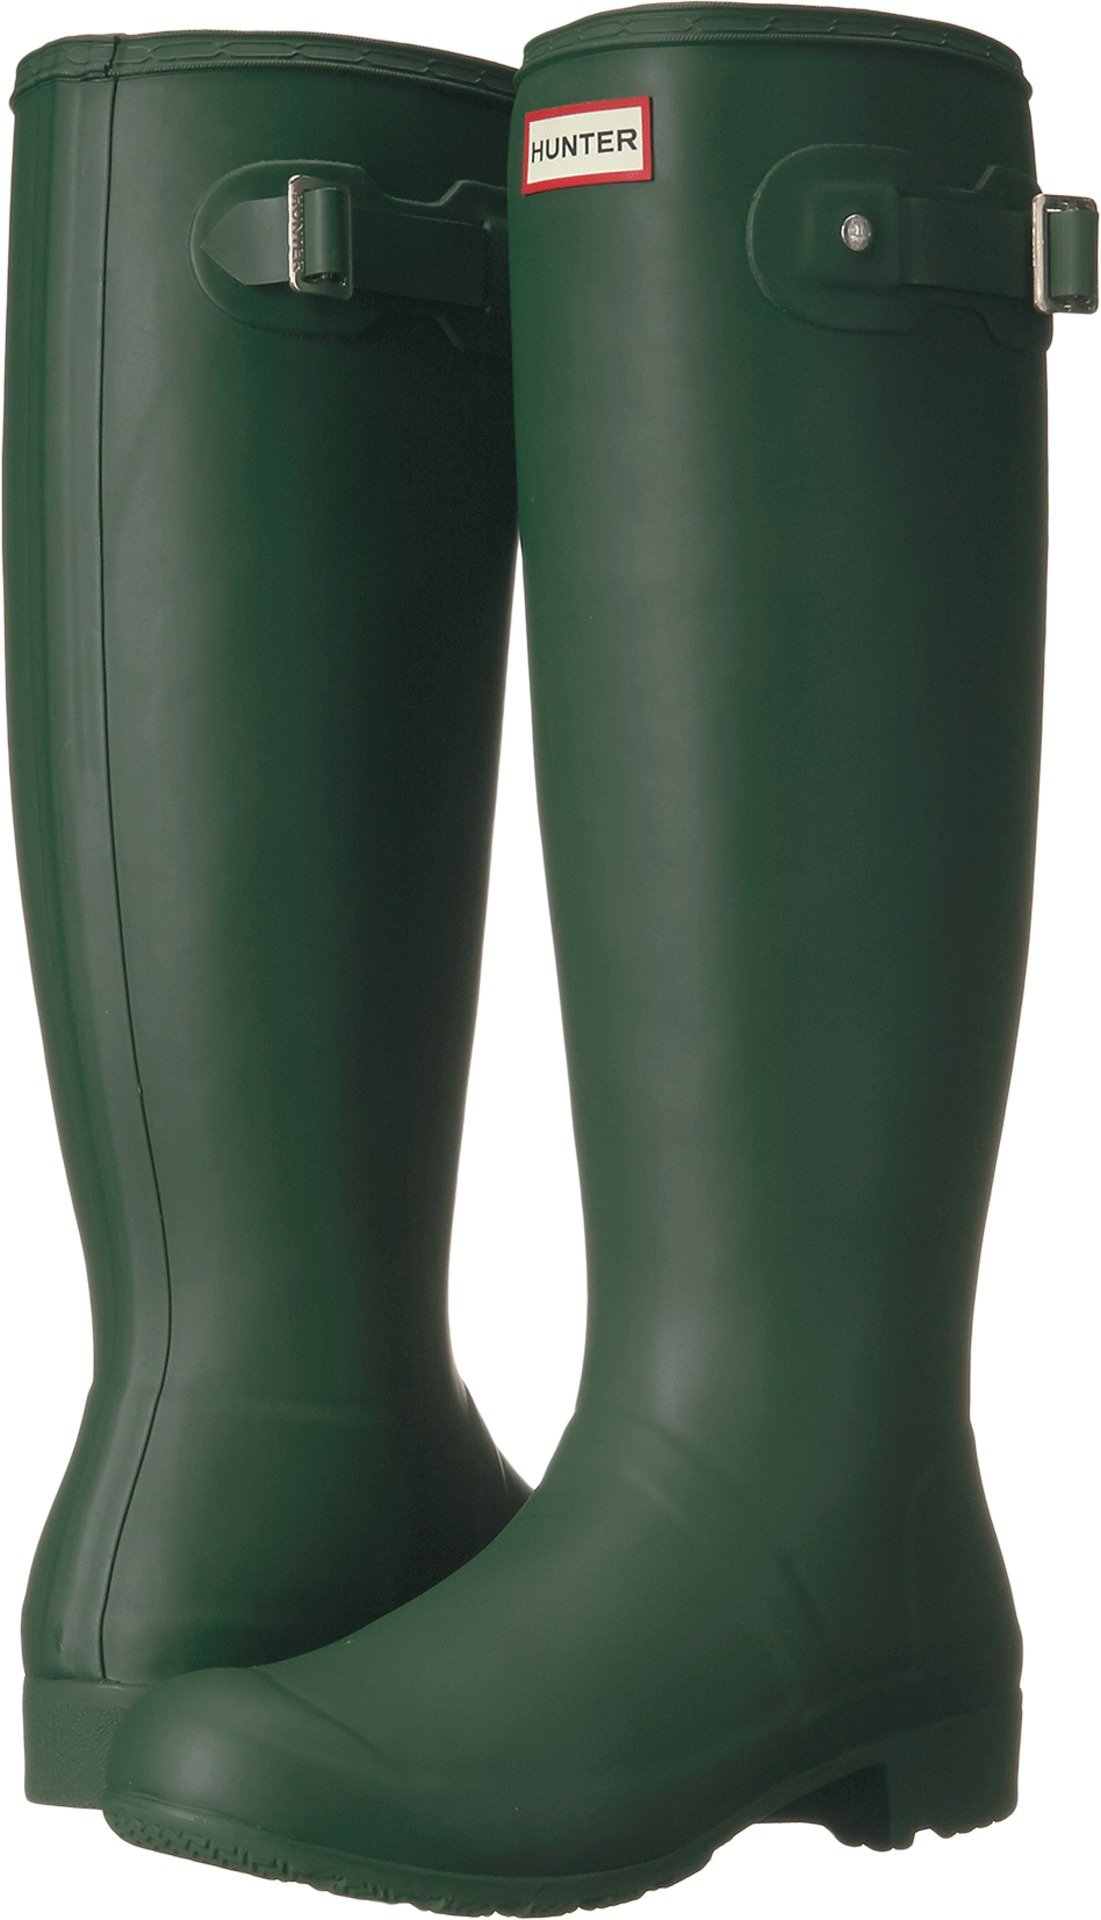 Hunter Original Tour Hunter Green Women's Rain Boots 9 M by Hunter (Image #1)